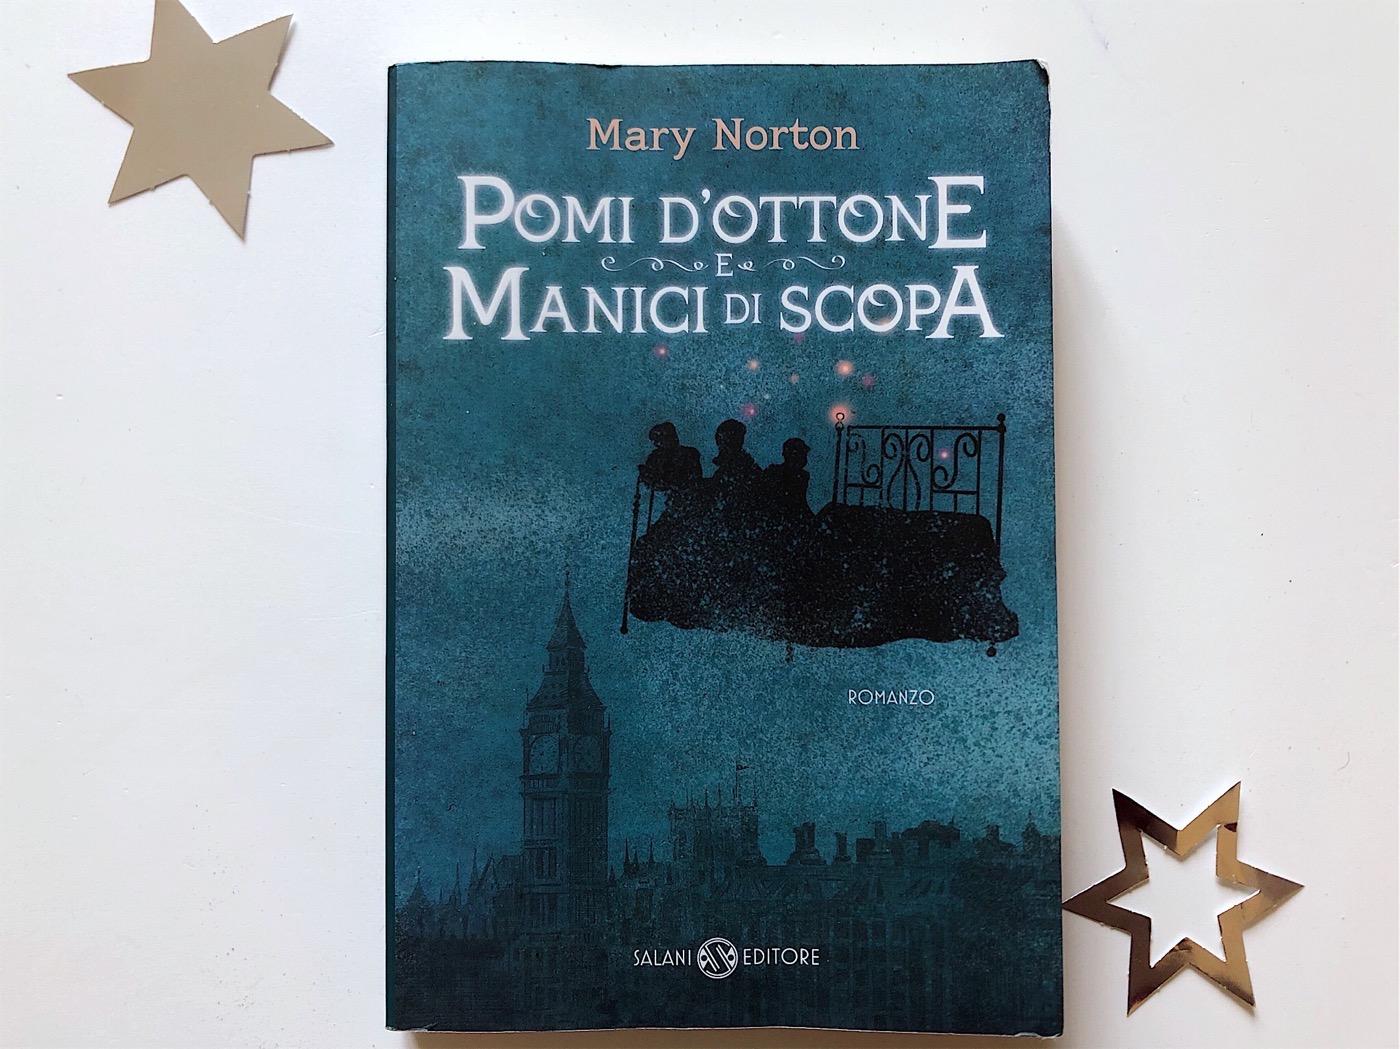 pomi_dottone_manici_scopa_mary_norton_salani